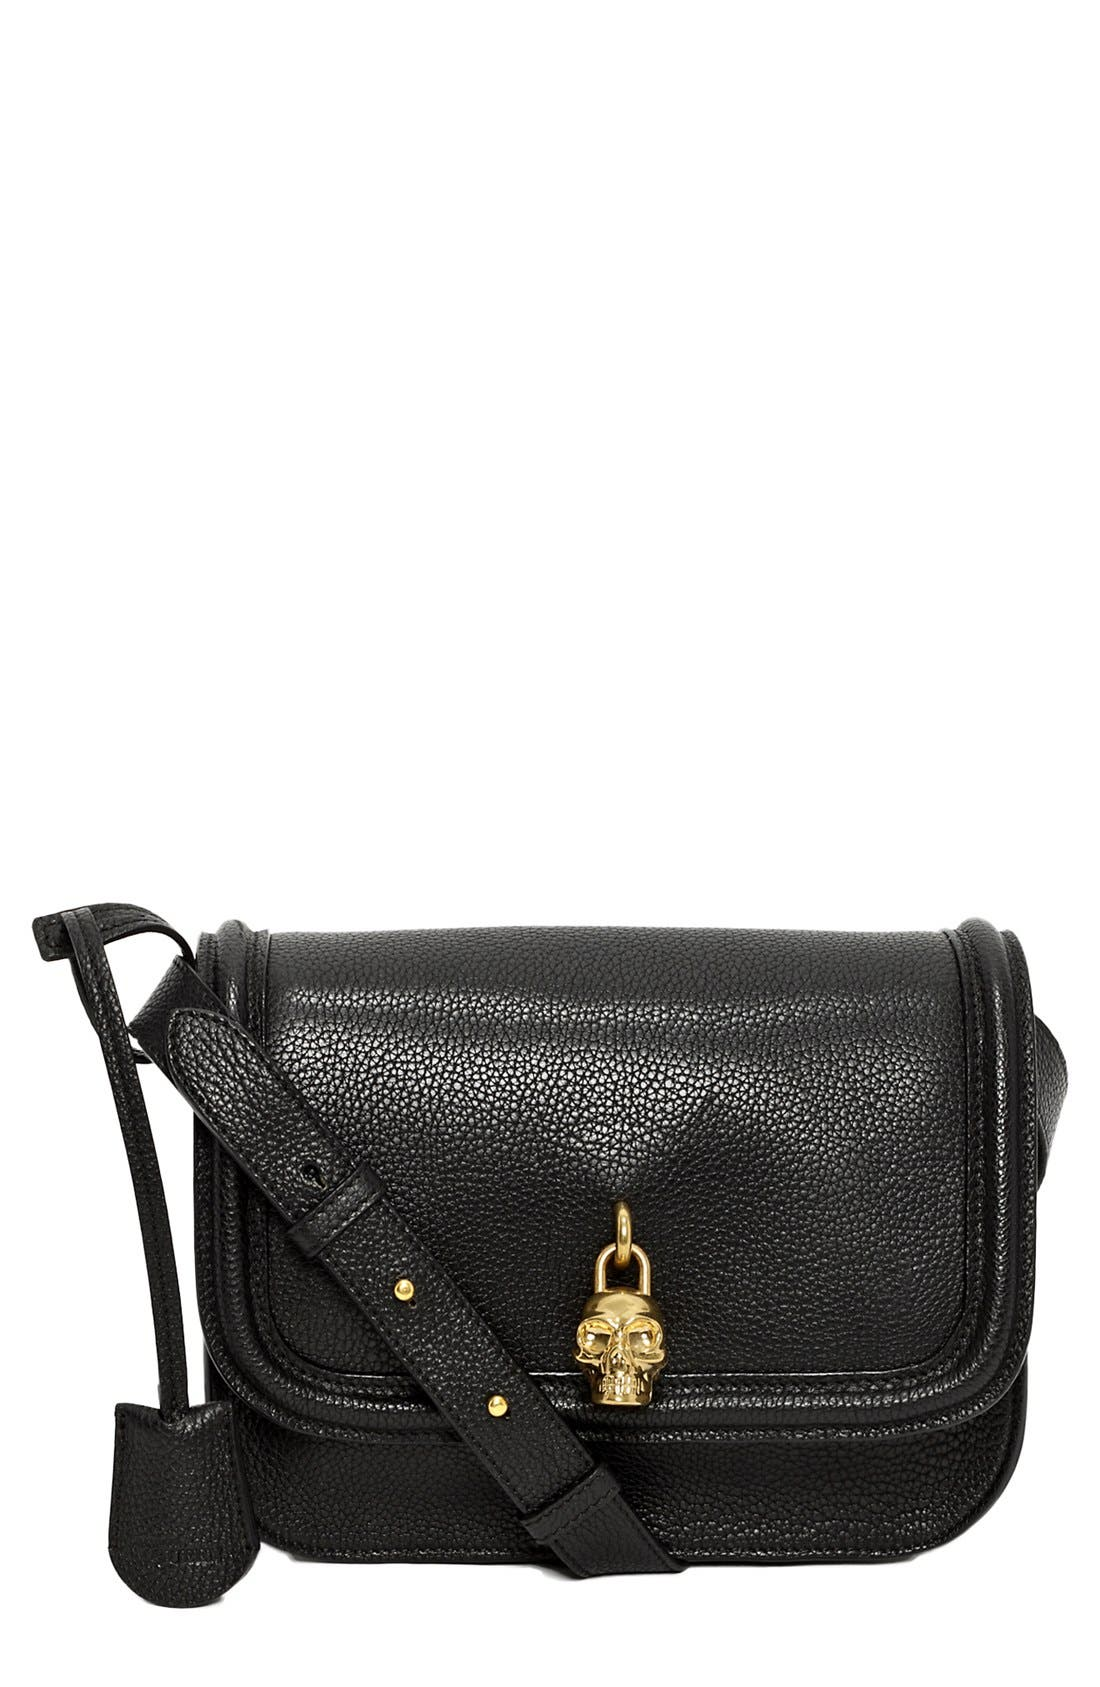 Main Image - Alexander McQueen Padlock Flap Calfskin Leather Crossbody Bag